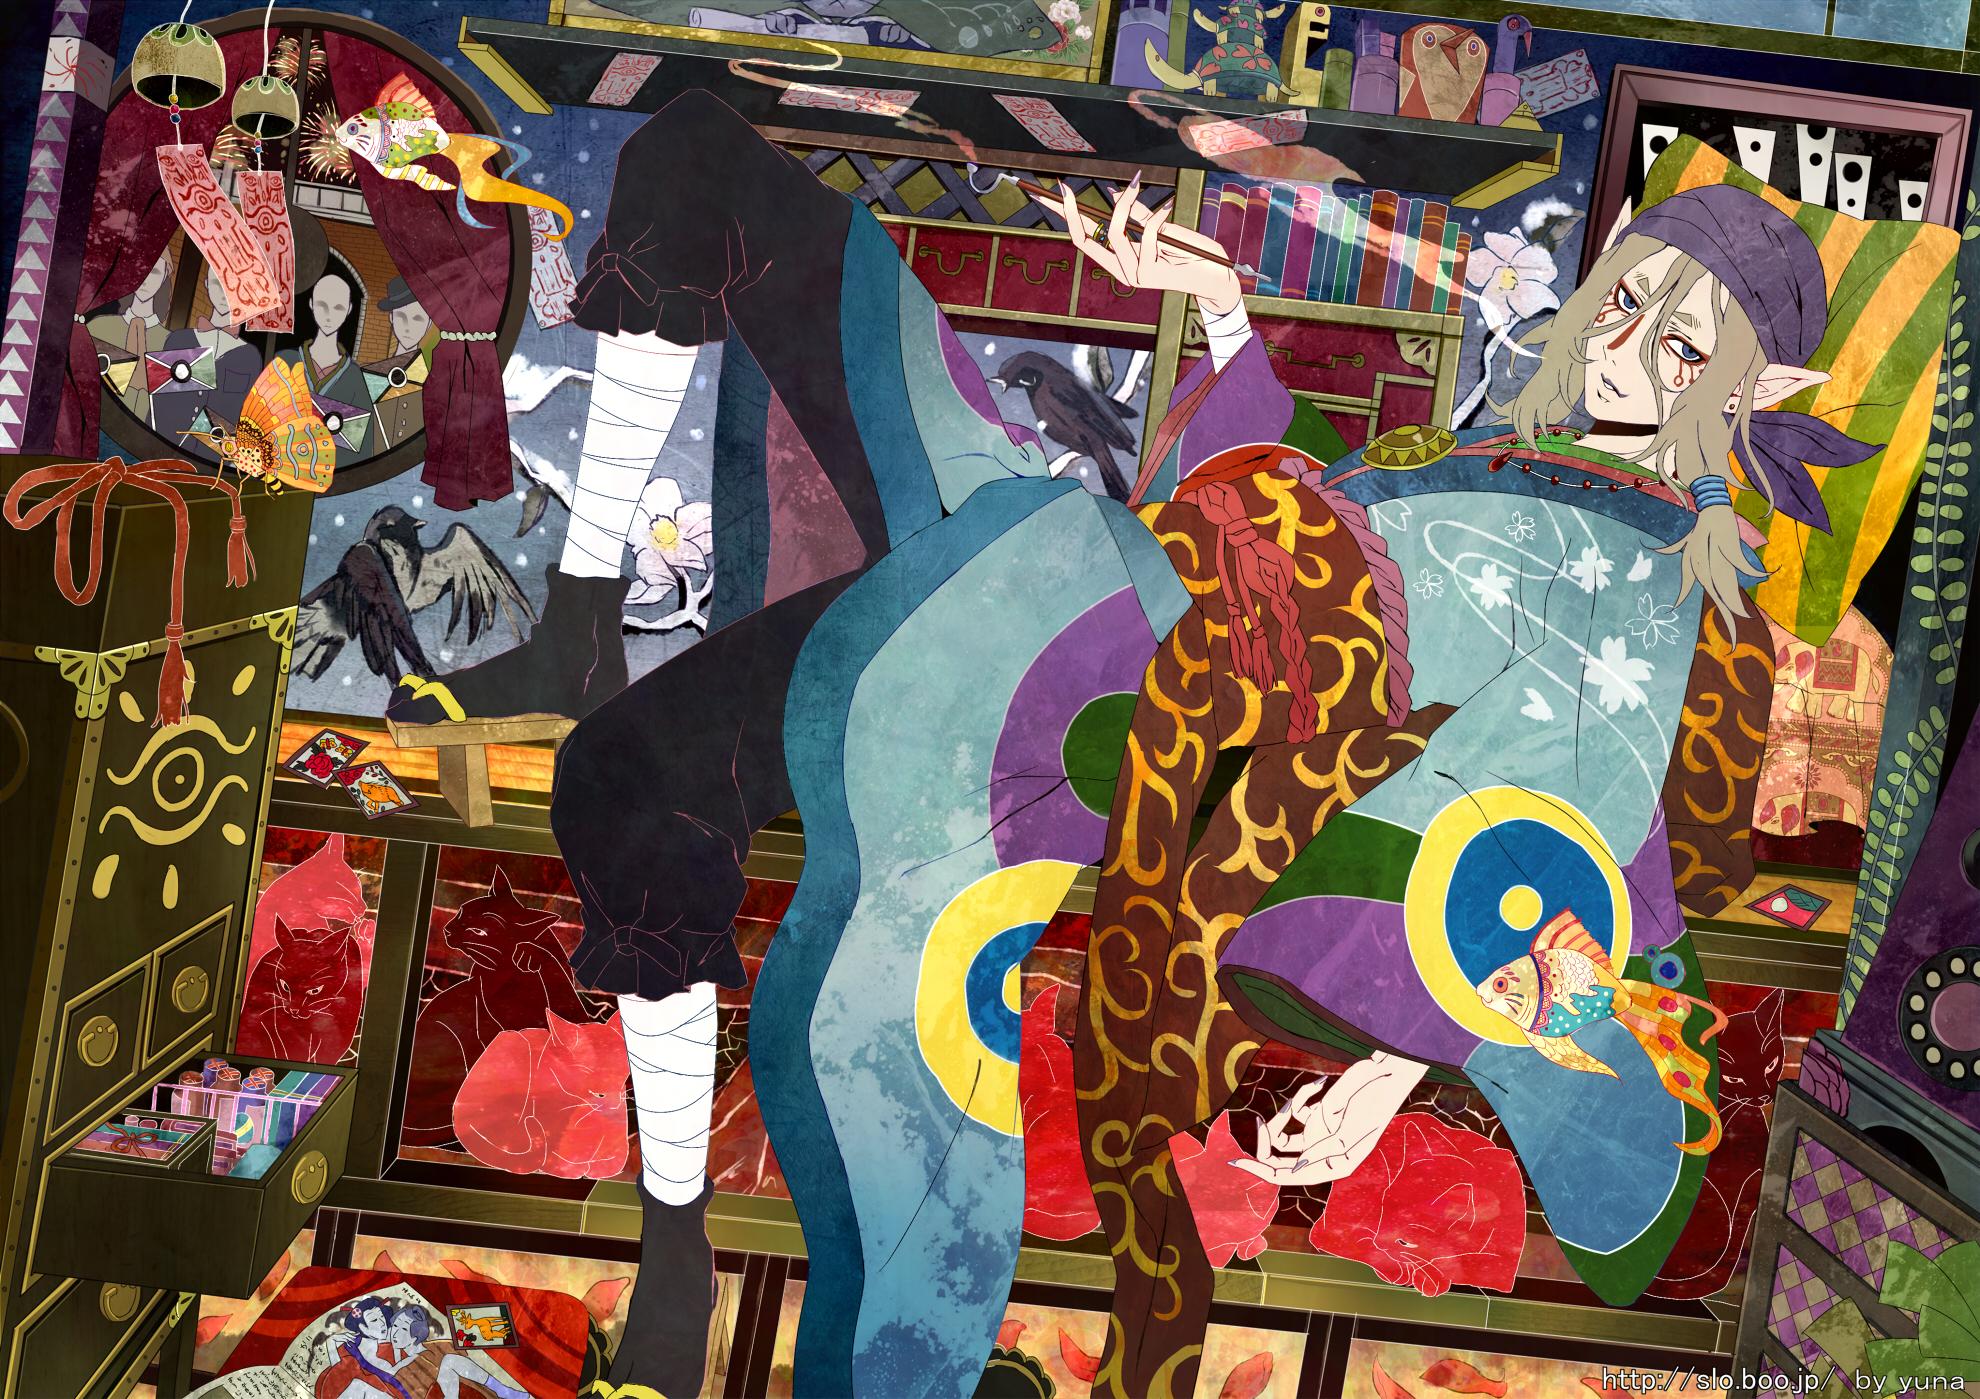 Mononoke hd wallpaper background image 1980x1399 id - Mononoke anime wallpaper ...